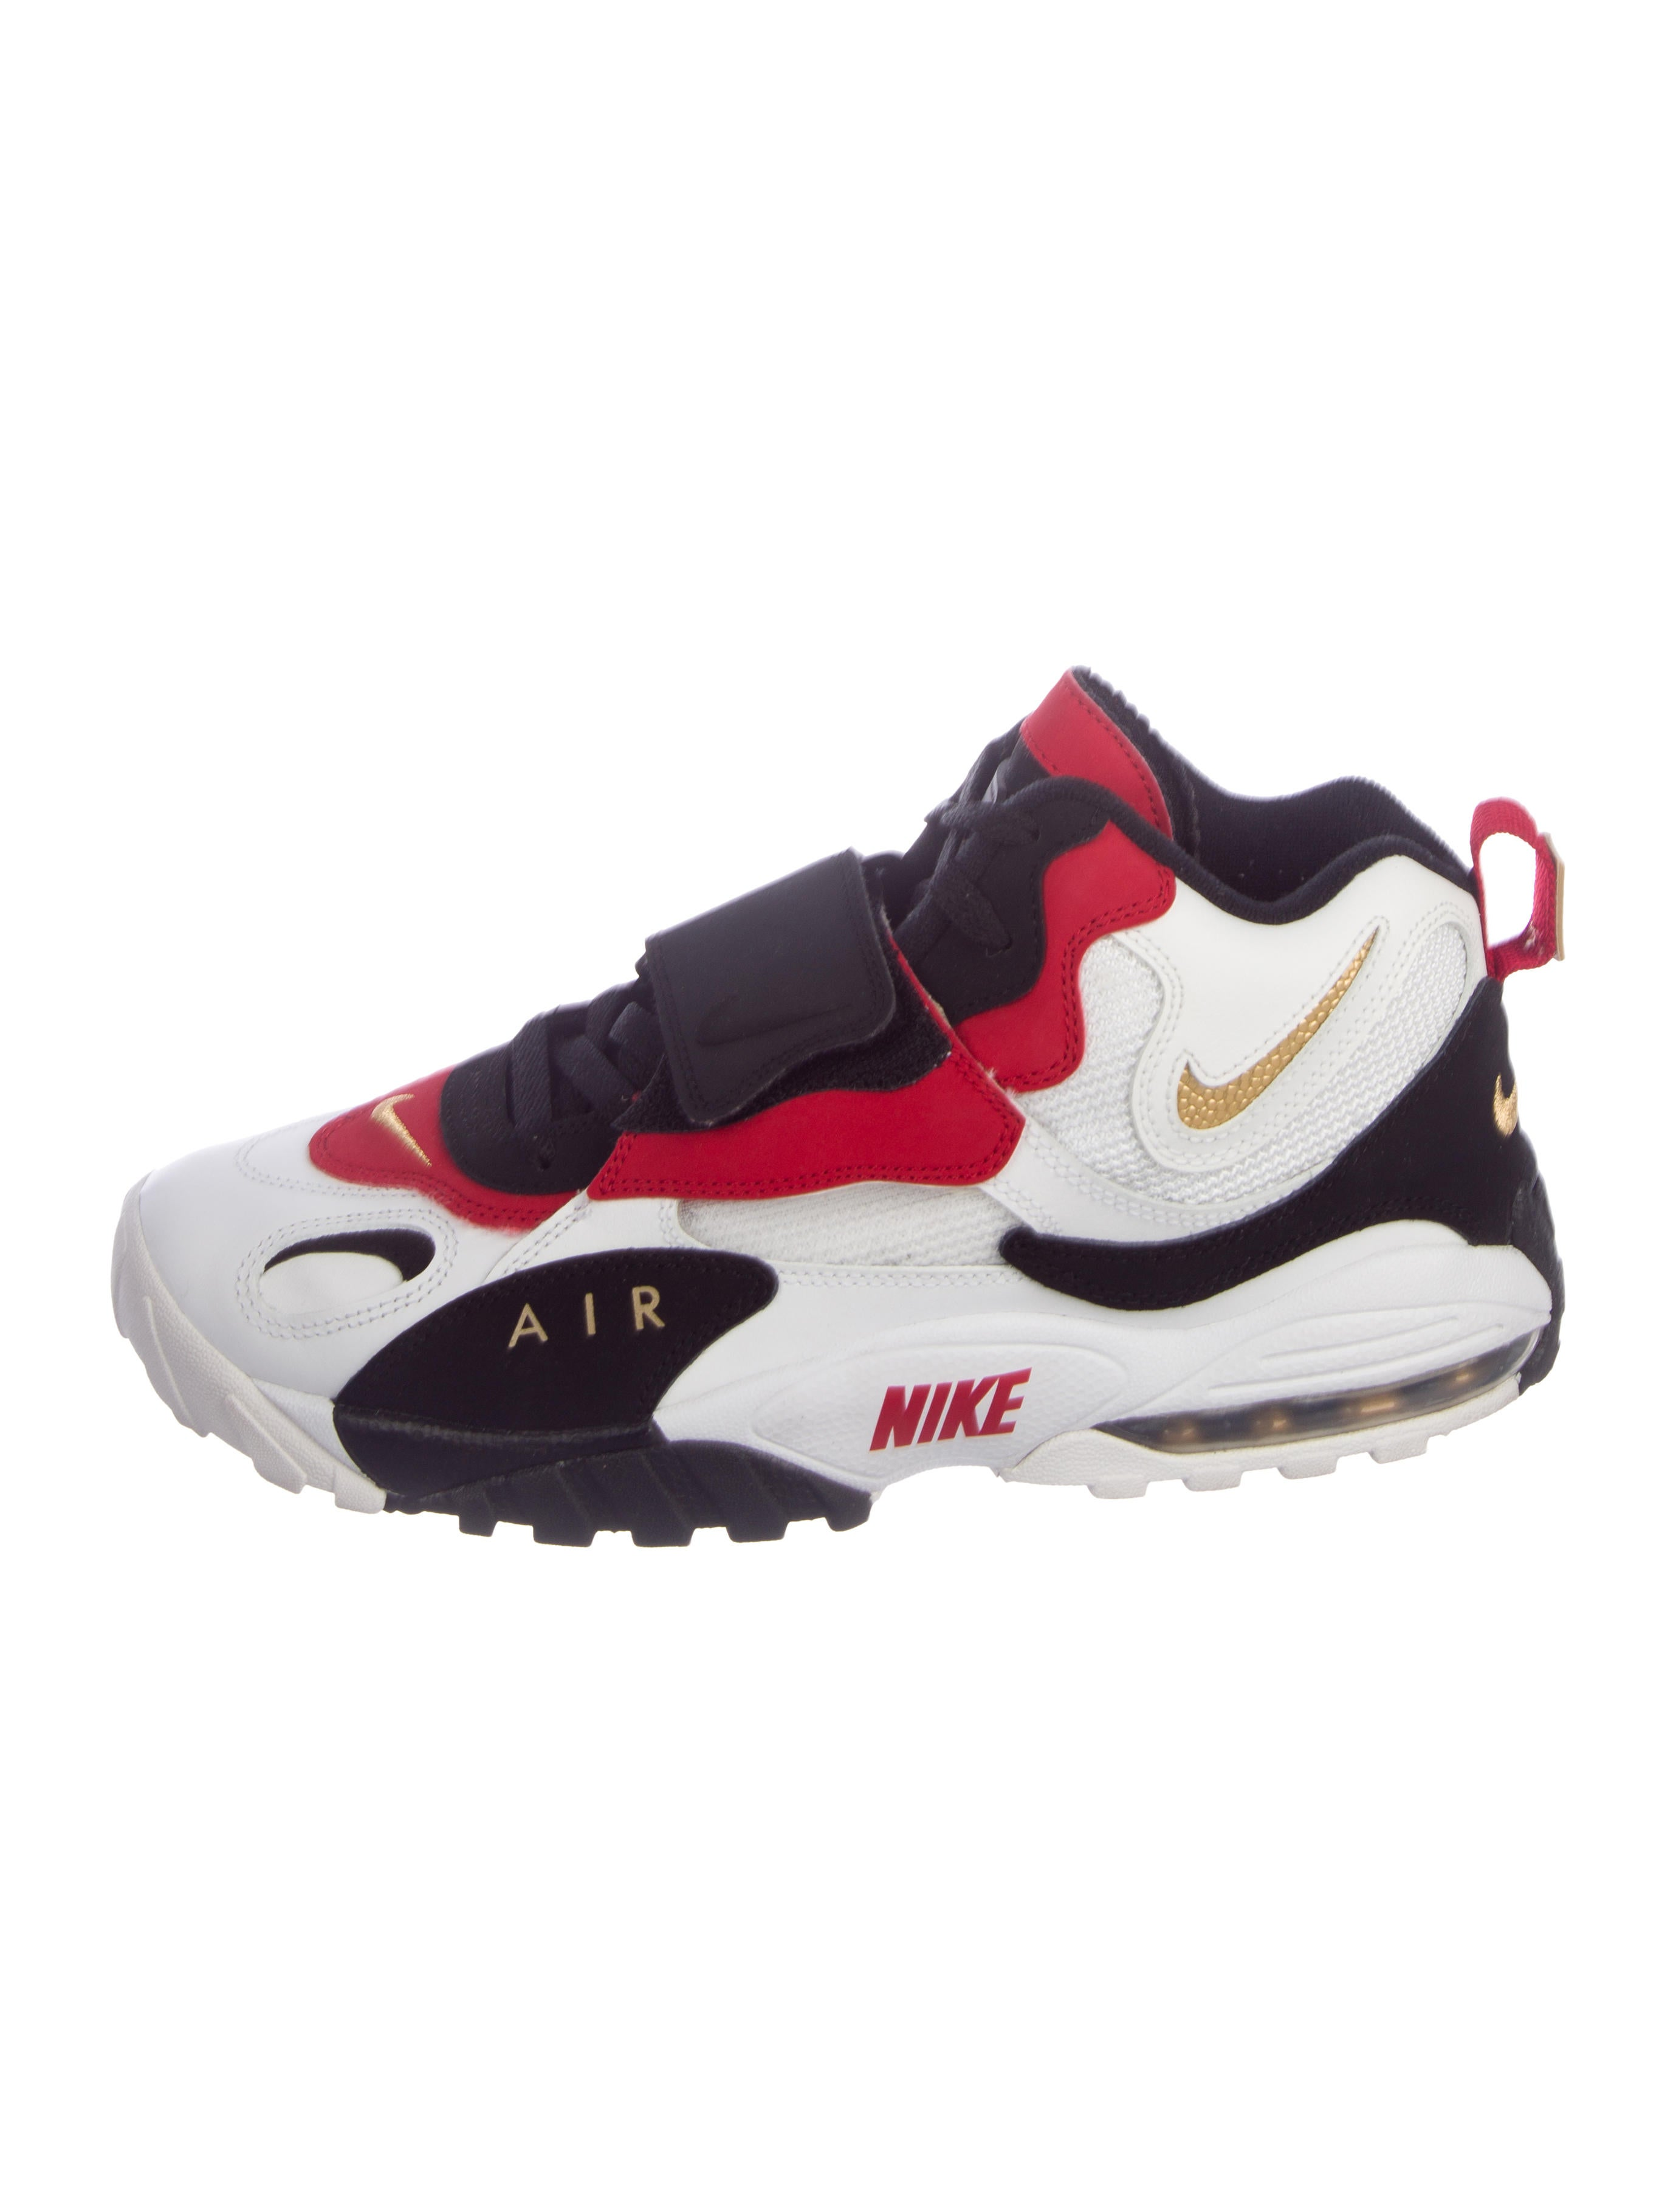 Nike Air Max Speed Turf 49ers Sneakers Shoes WU232476